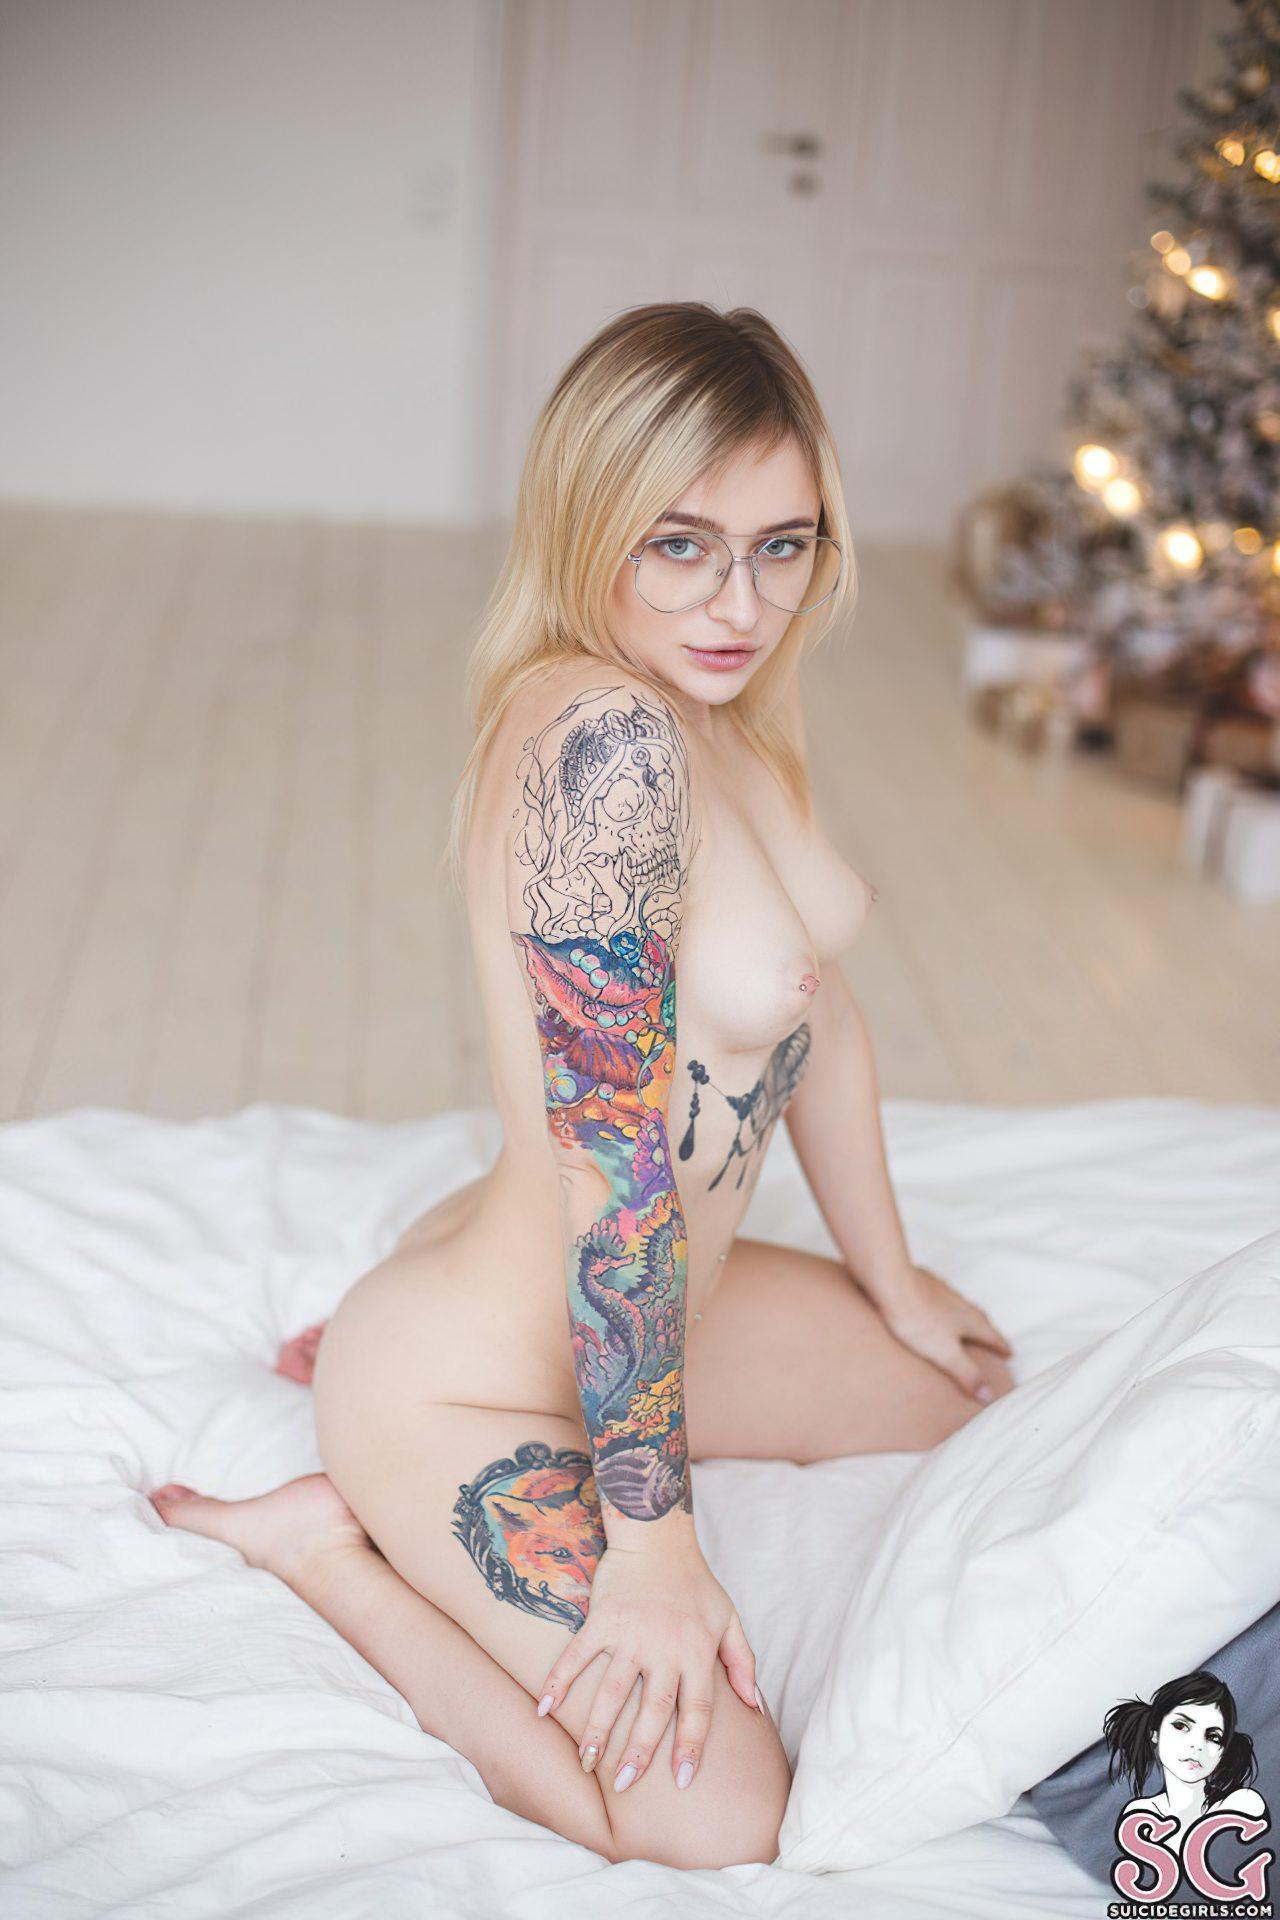 Fotos de Mulheres Despidas (5)